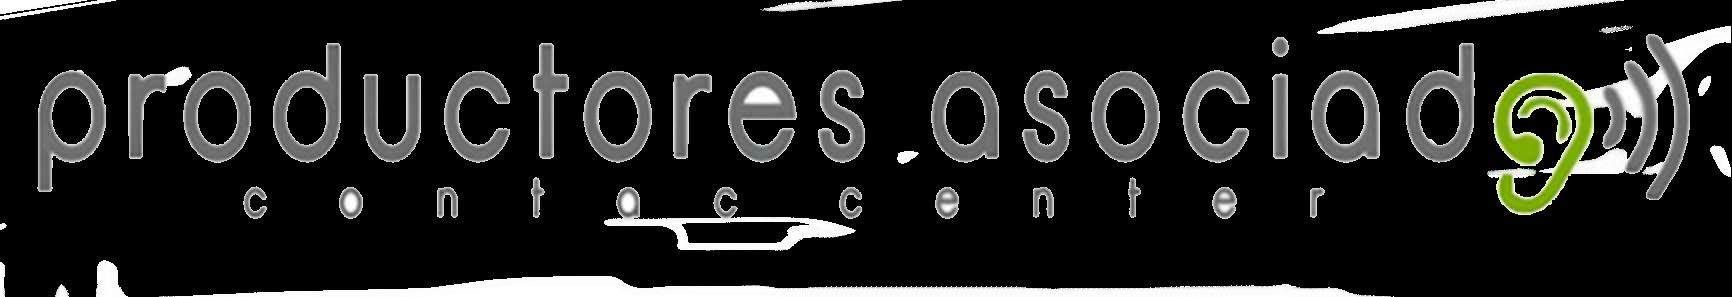 PRODUCTORES ASOCIADOS S.A.S